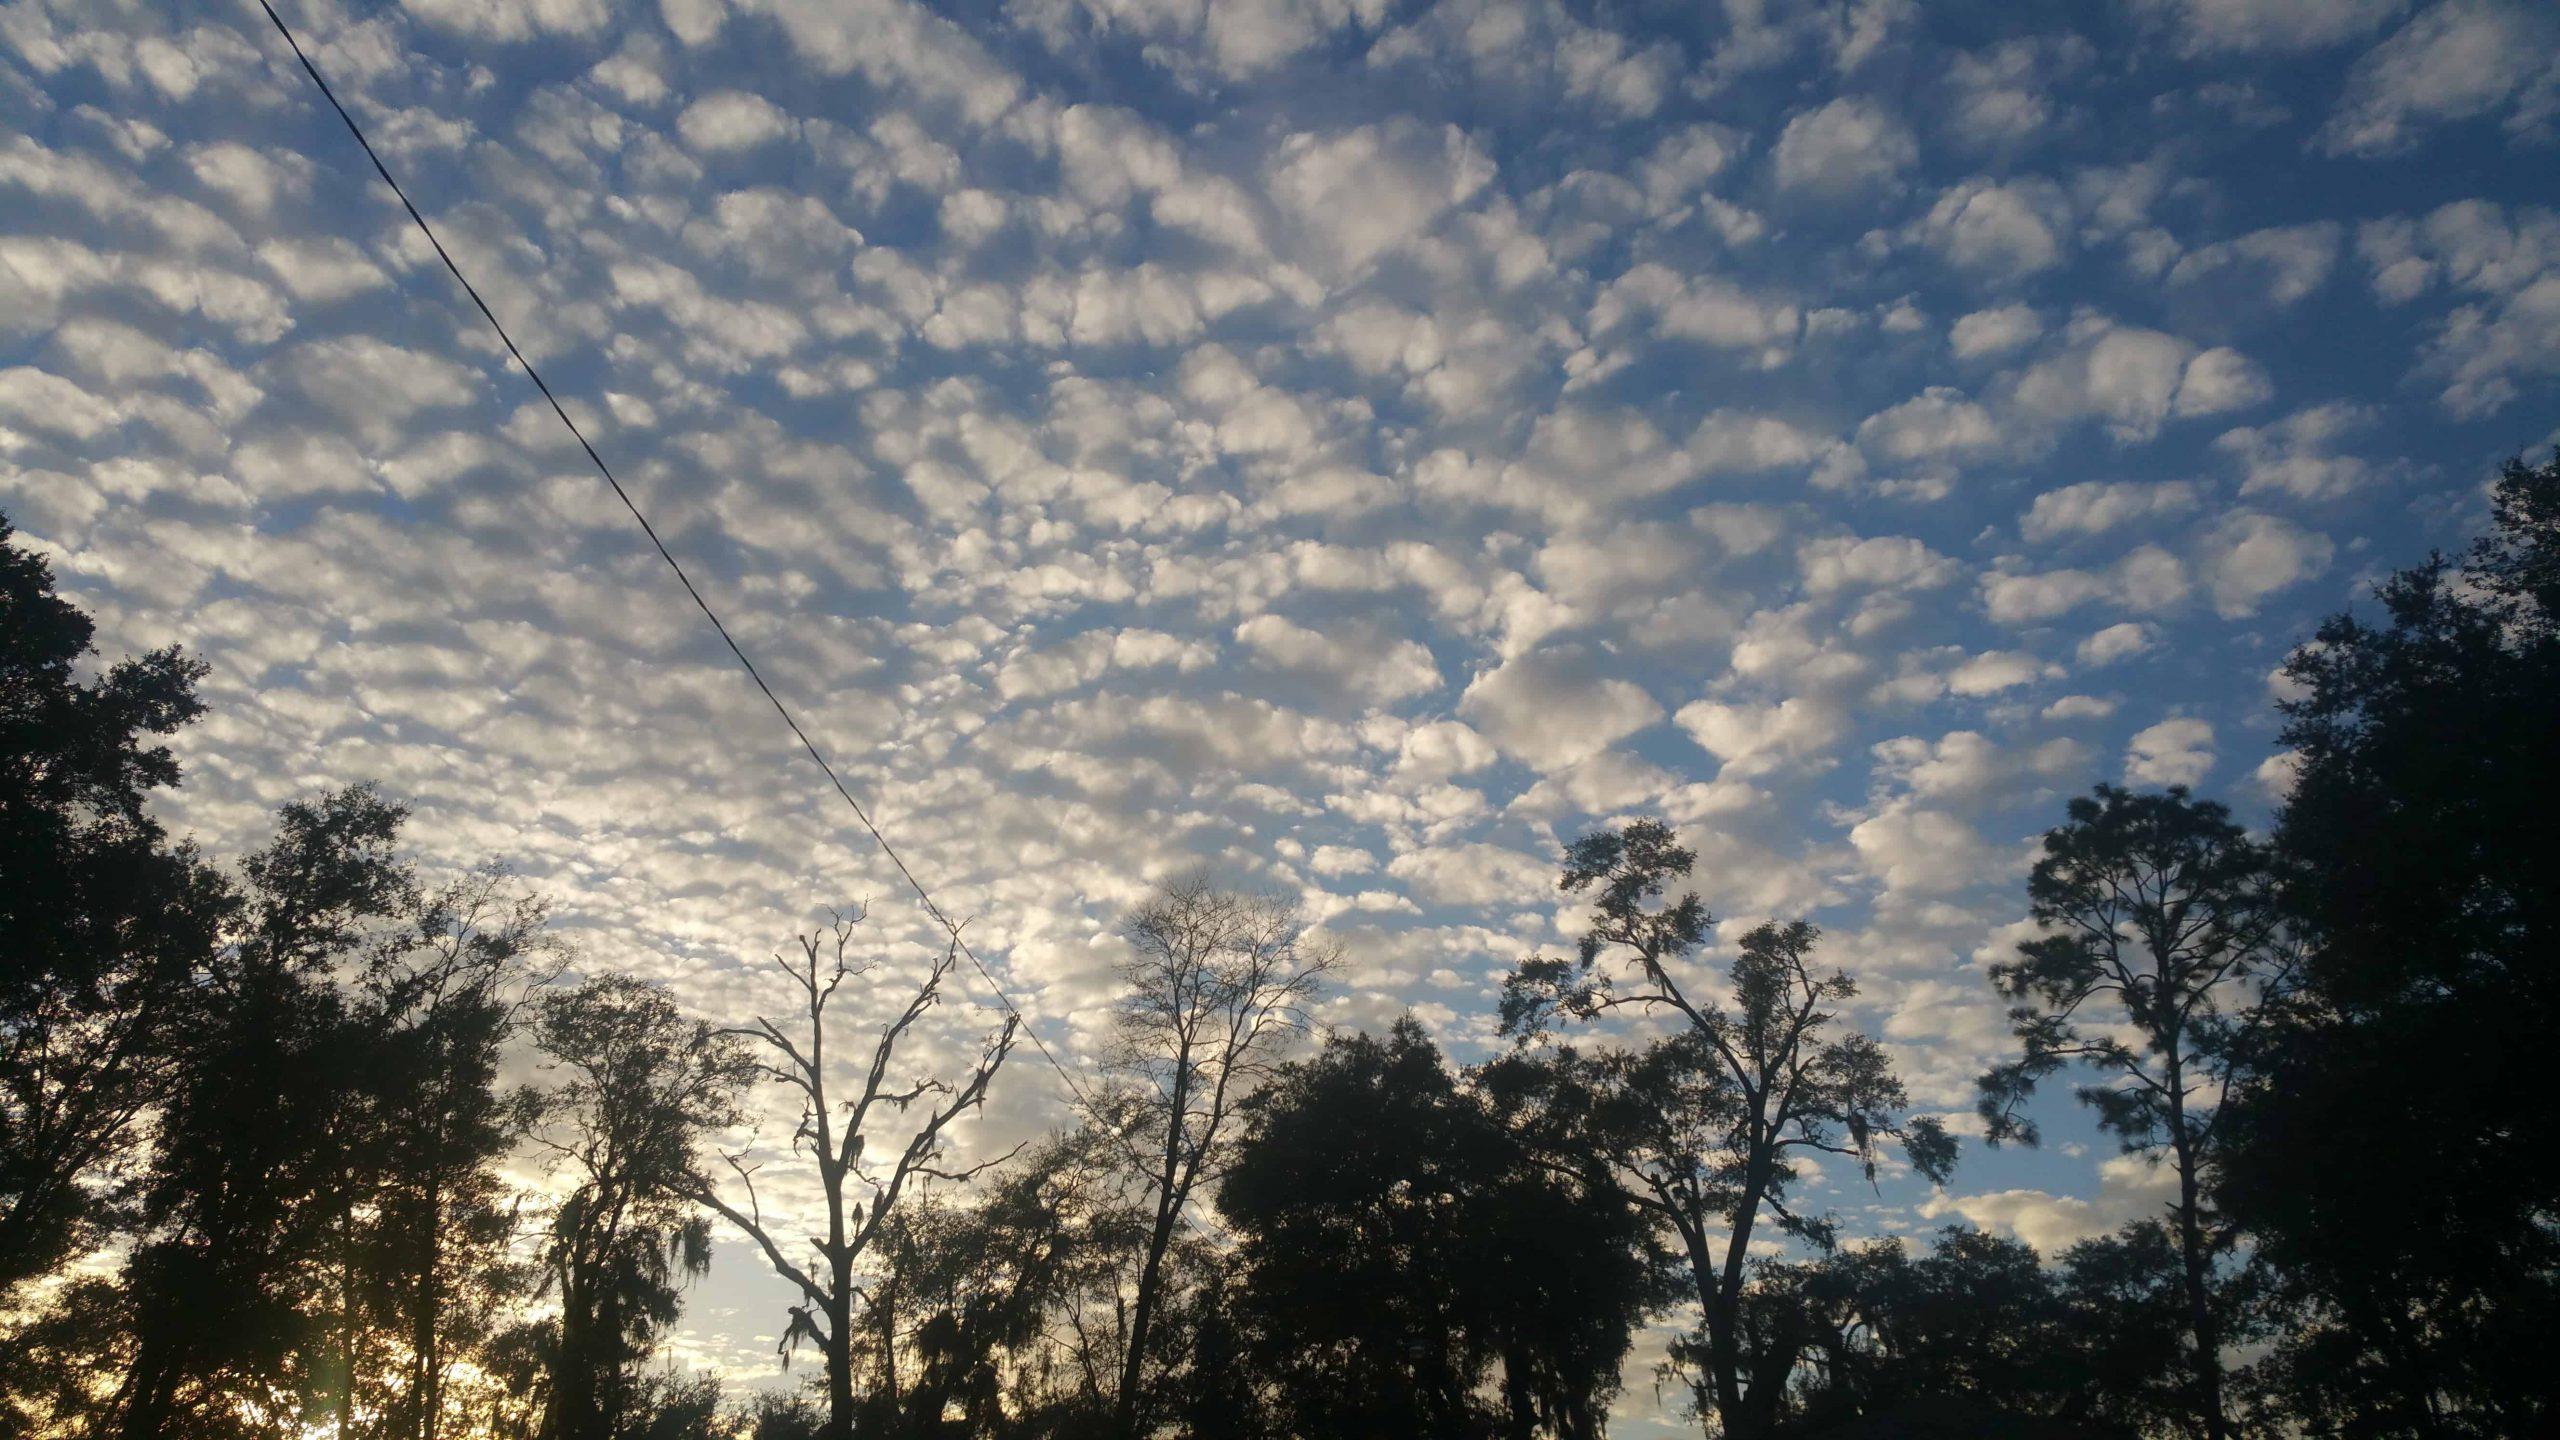 Clouds - December 14, 2017 - 5